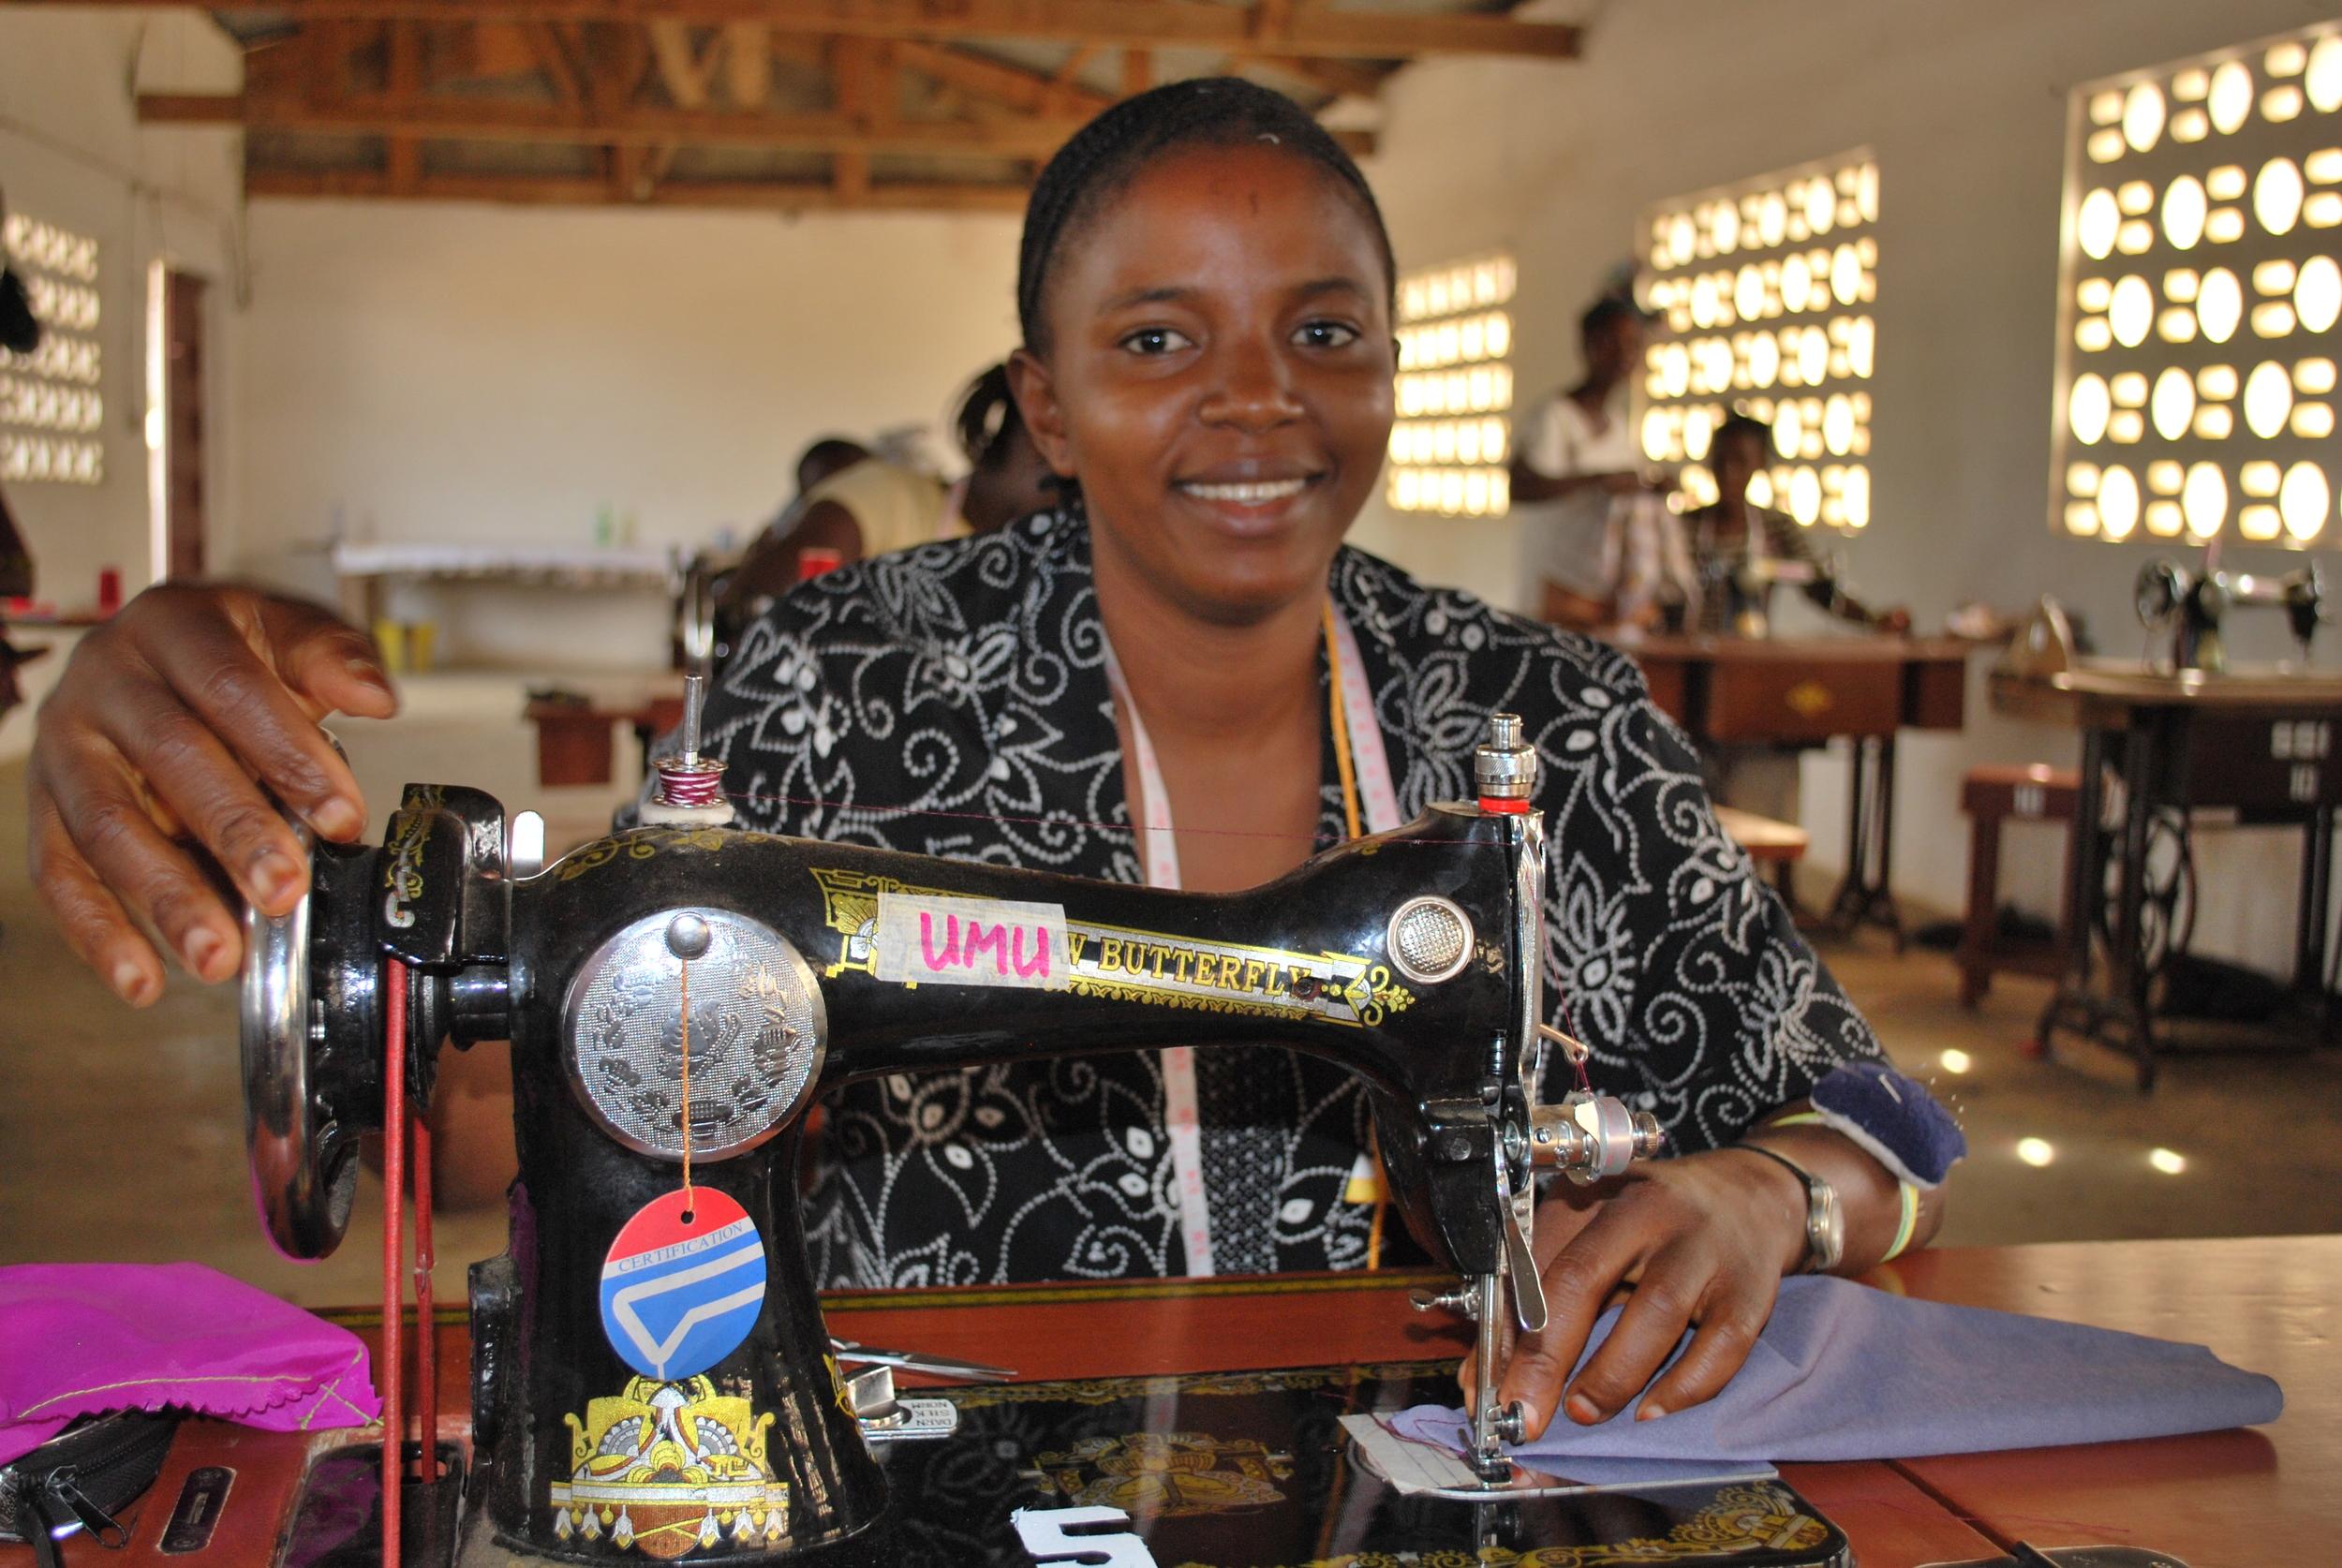 Sierra Leone Sewing Umu.JPG